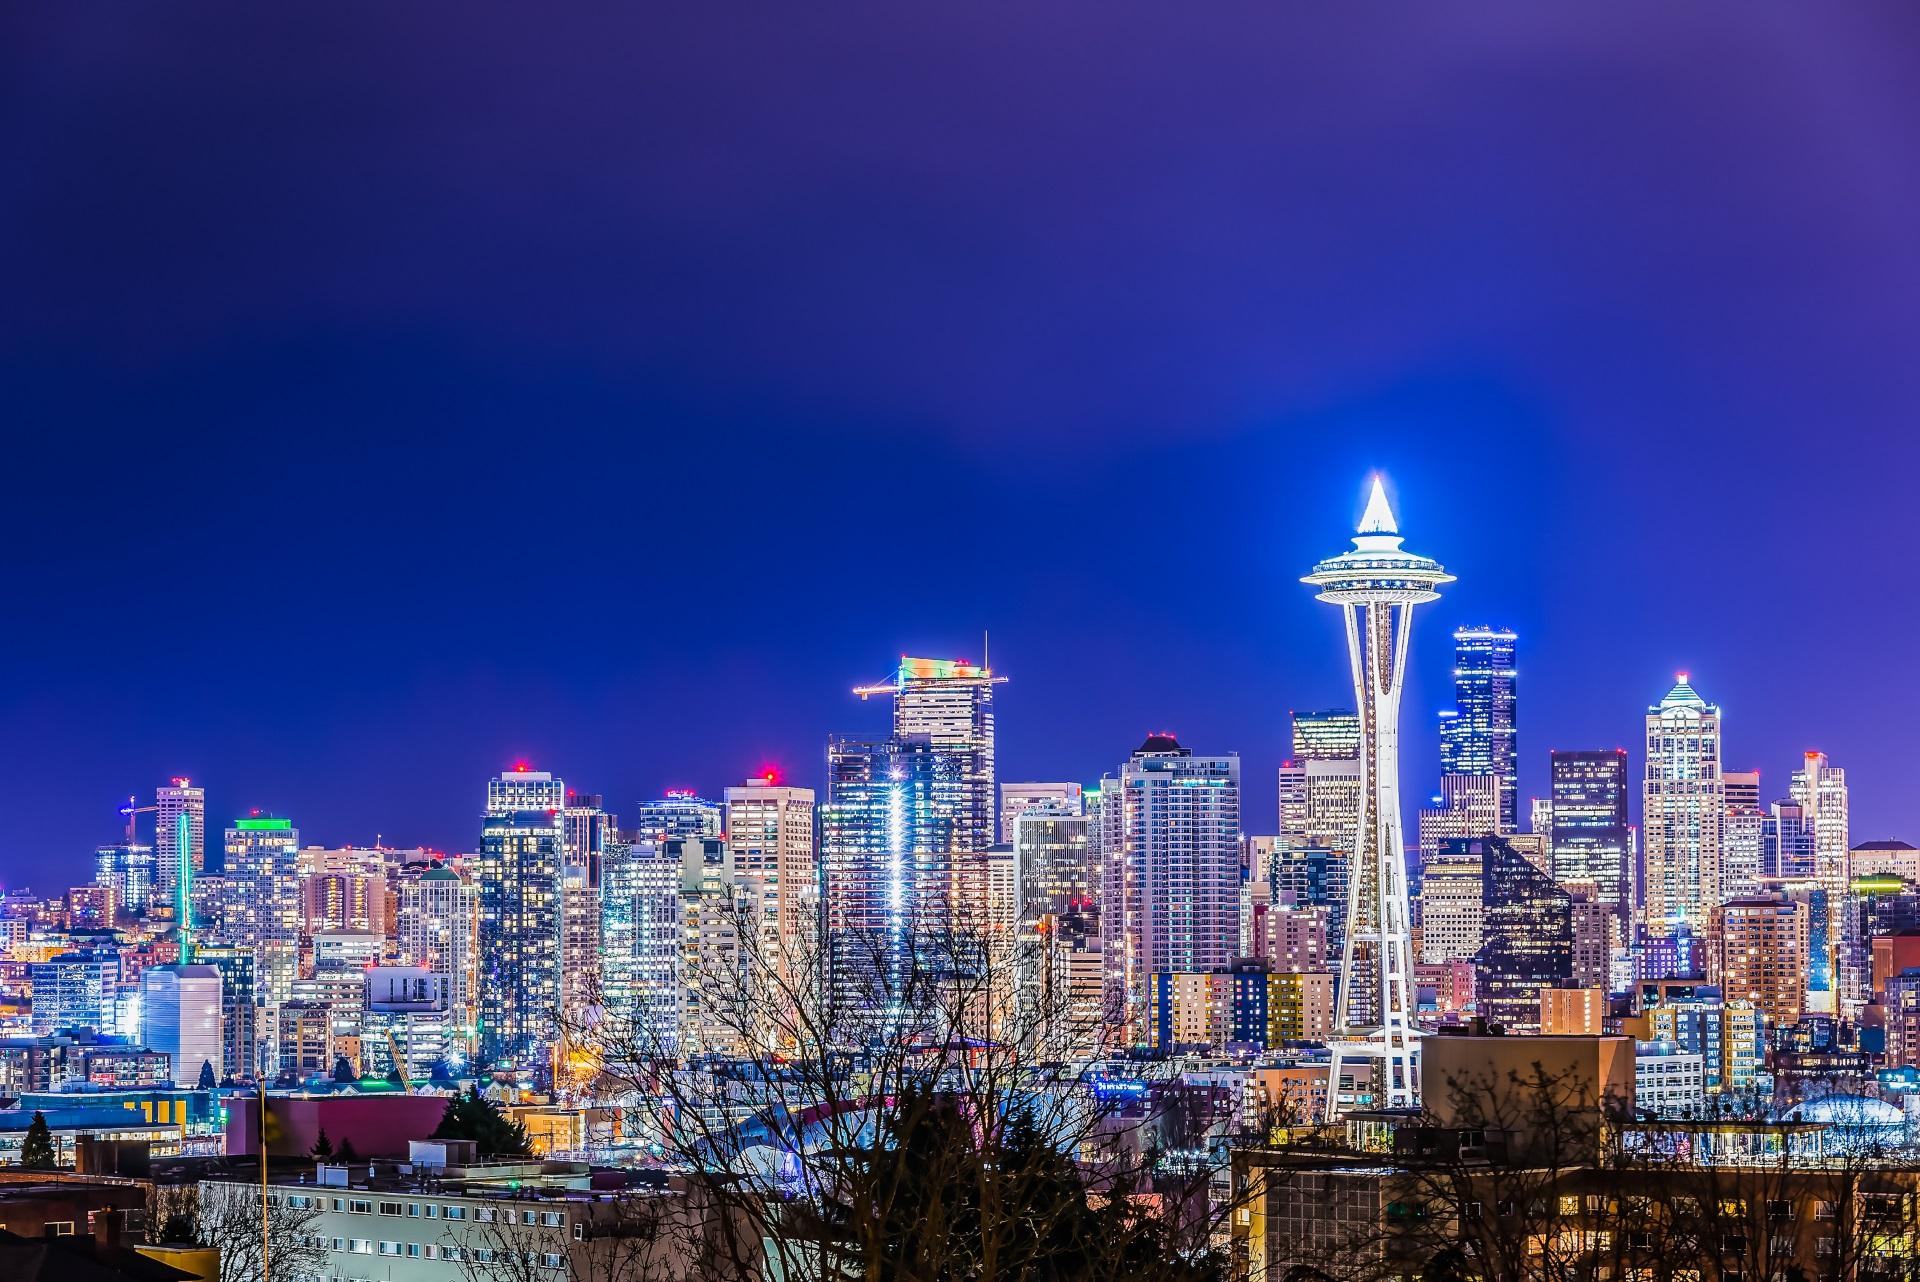 Seattle Sehenswürdigkeiten Space Needle Städtereisen